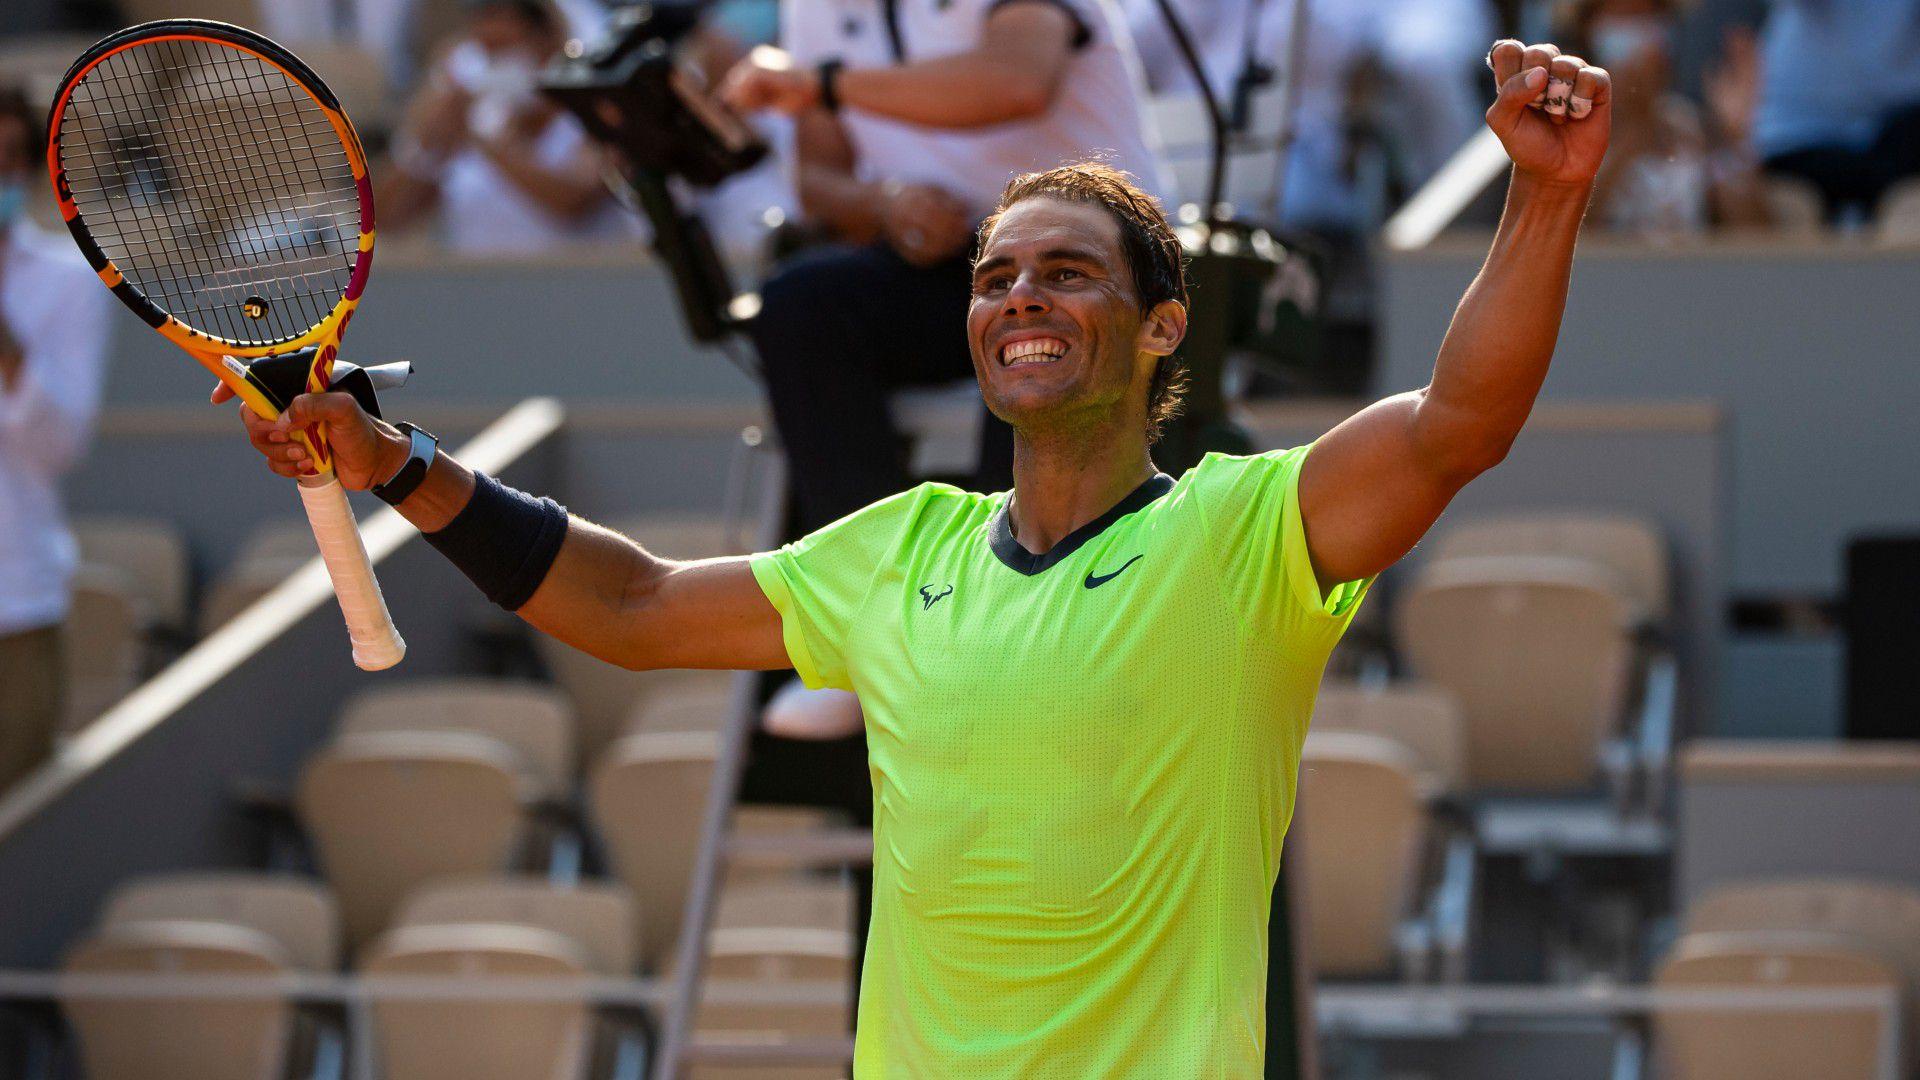 Rafael Nadal into 14th Roland Garros semi-final